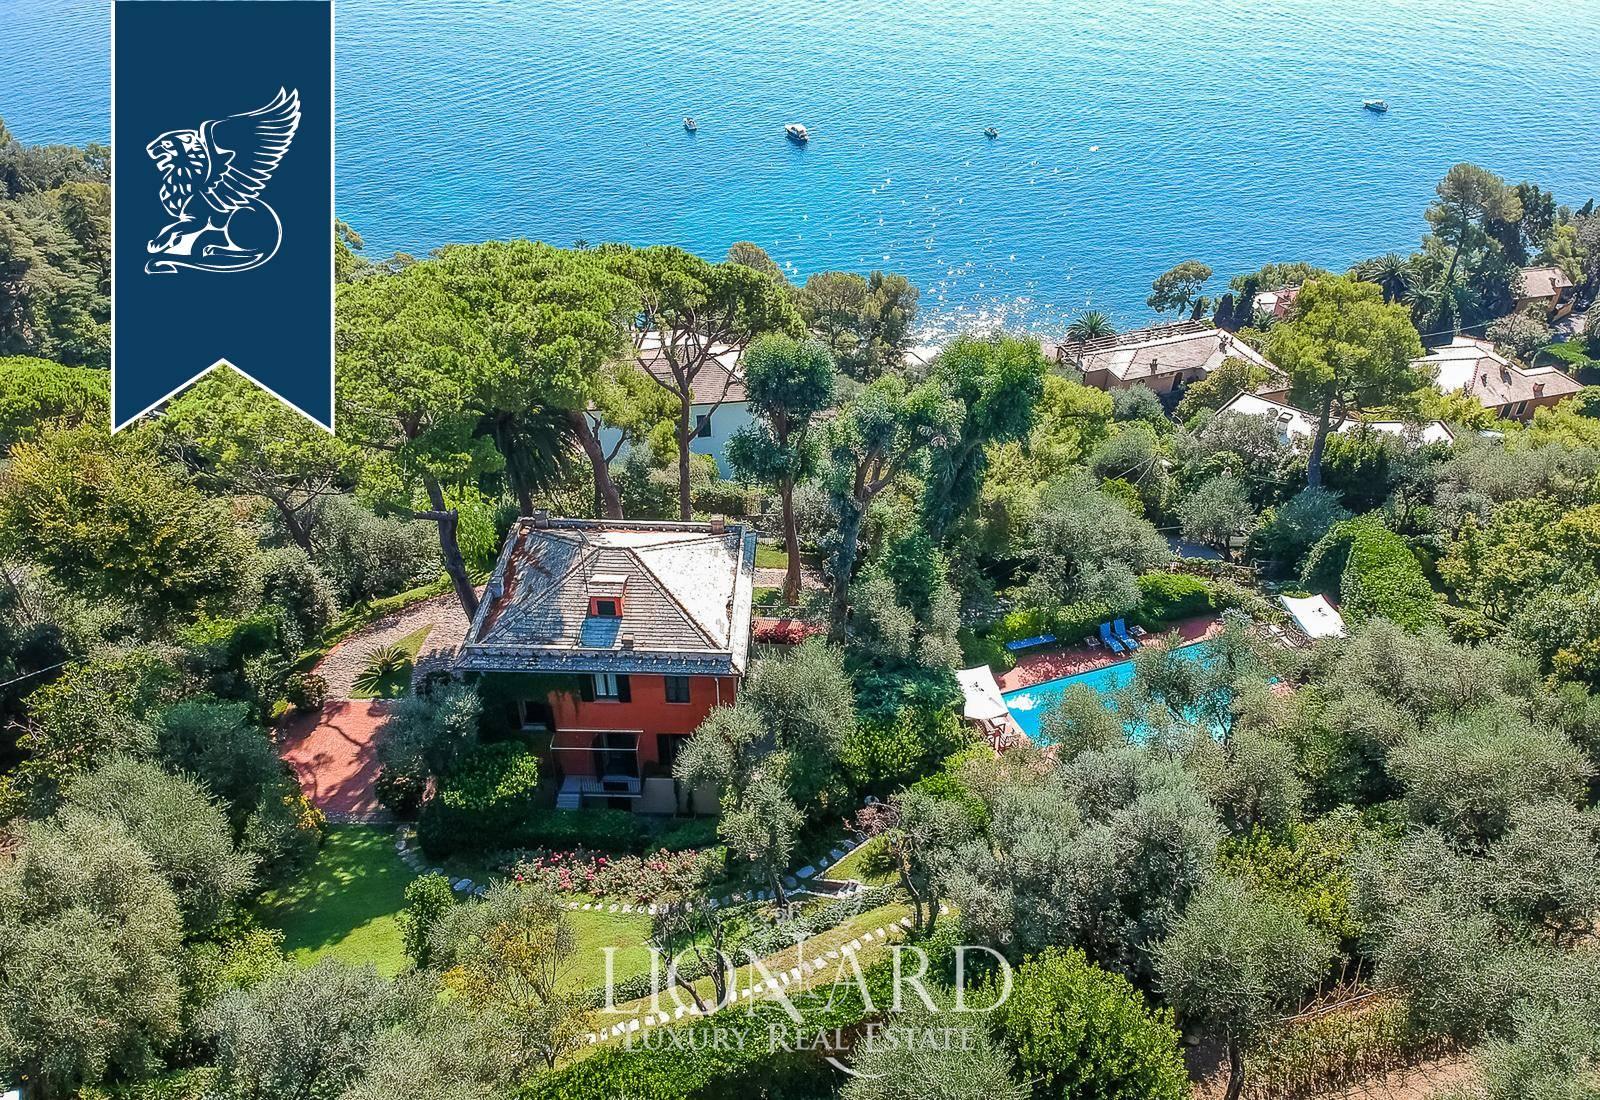 Villa in Vendita a Santa Margherita Ligure: 0 locali, 459 mq - Foto 2